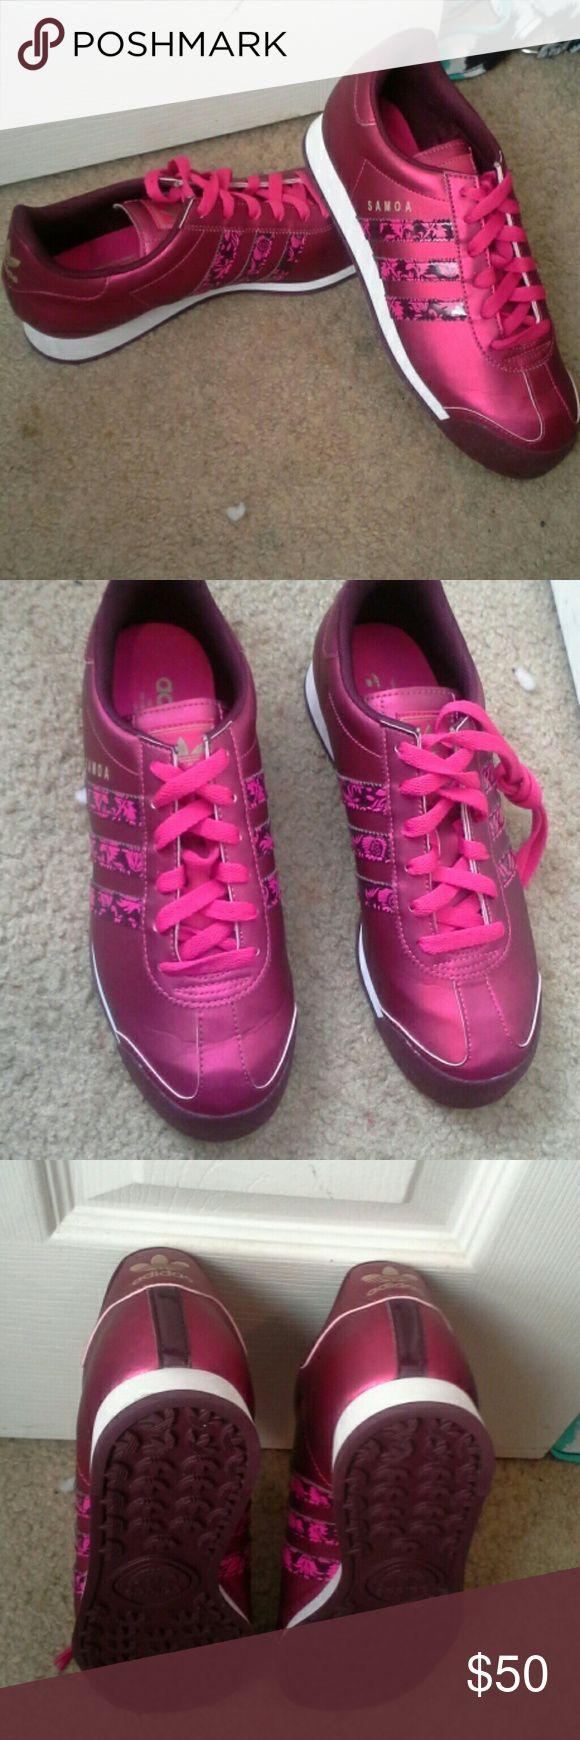 Adidas Somas Slight creases, worn 2-3 times. adidas Shoes Sneakers